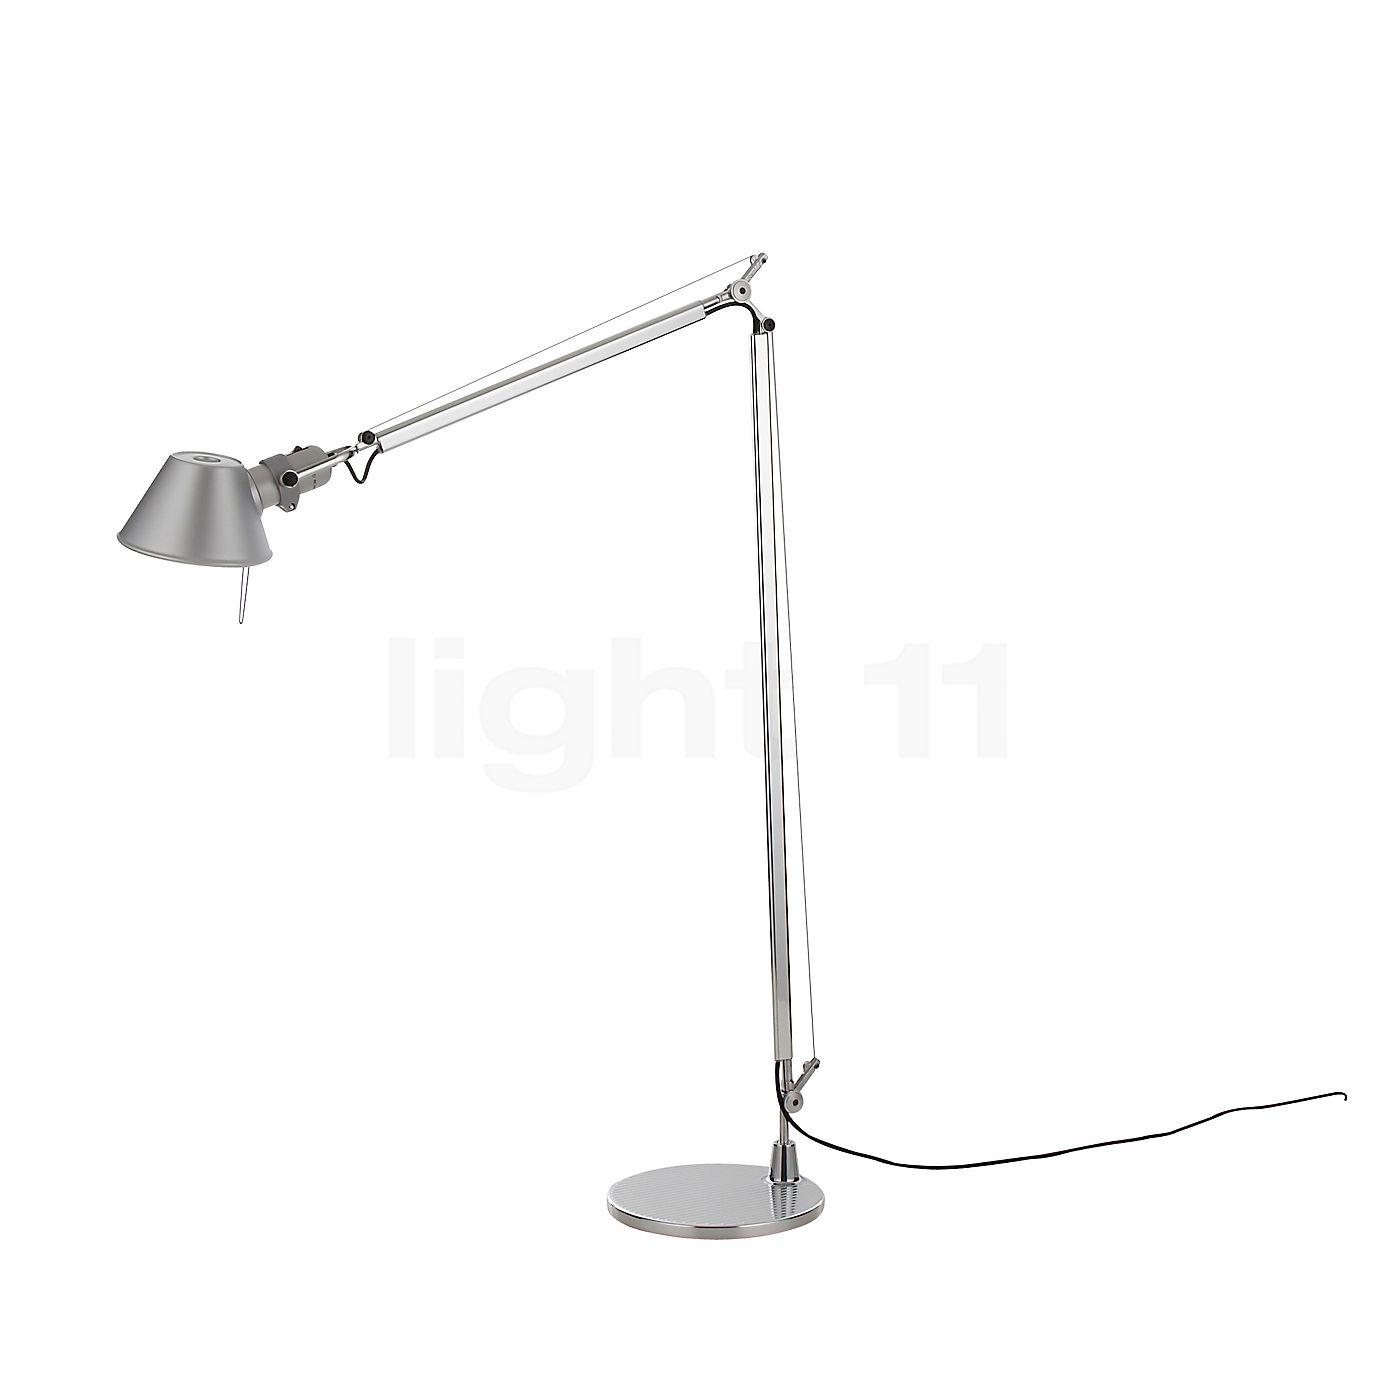 Artemide Tolomeo Lettura Lampen Und Wolle Kaufen